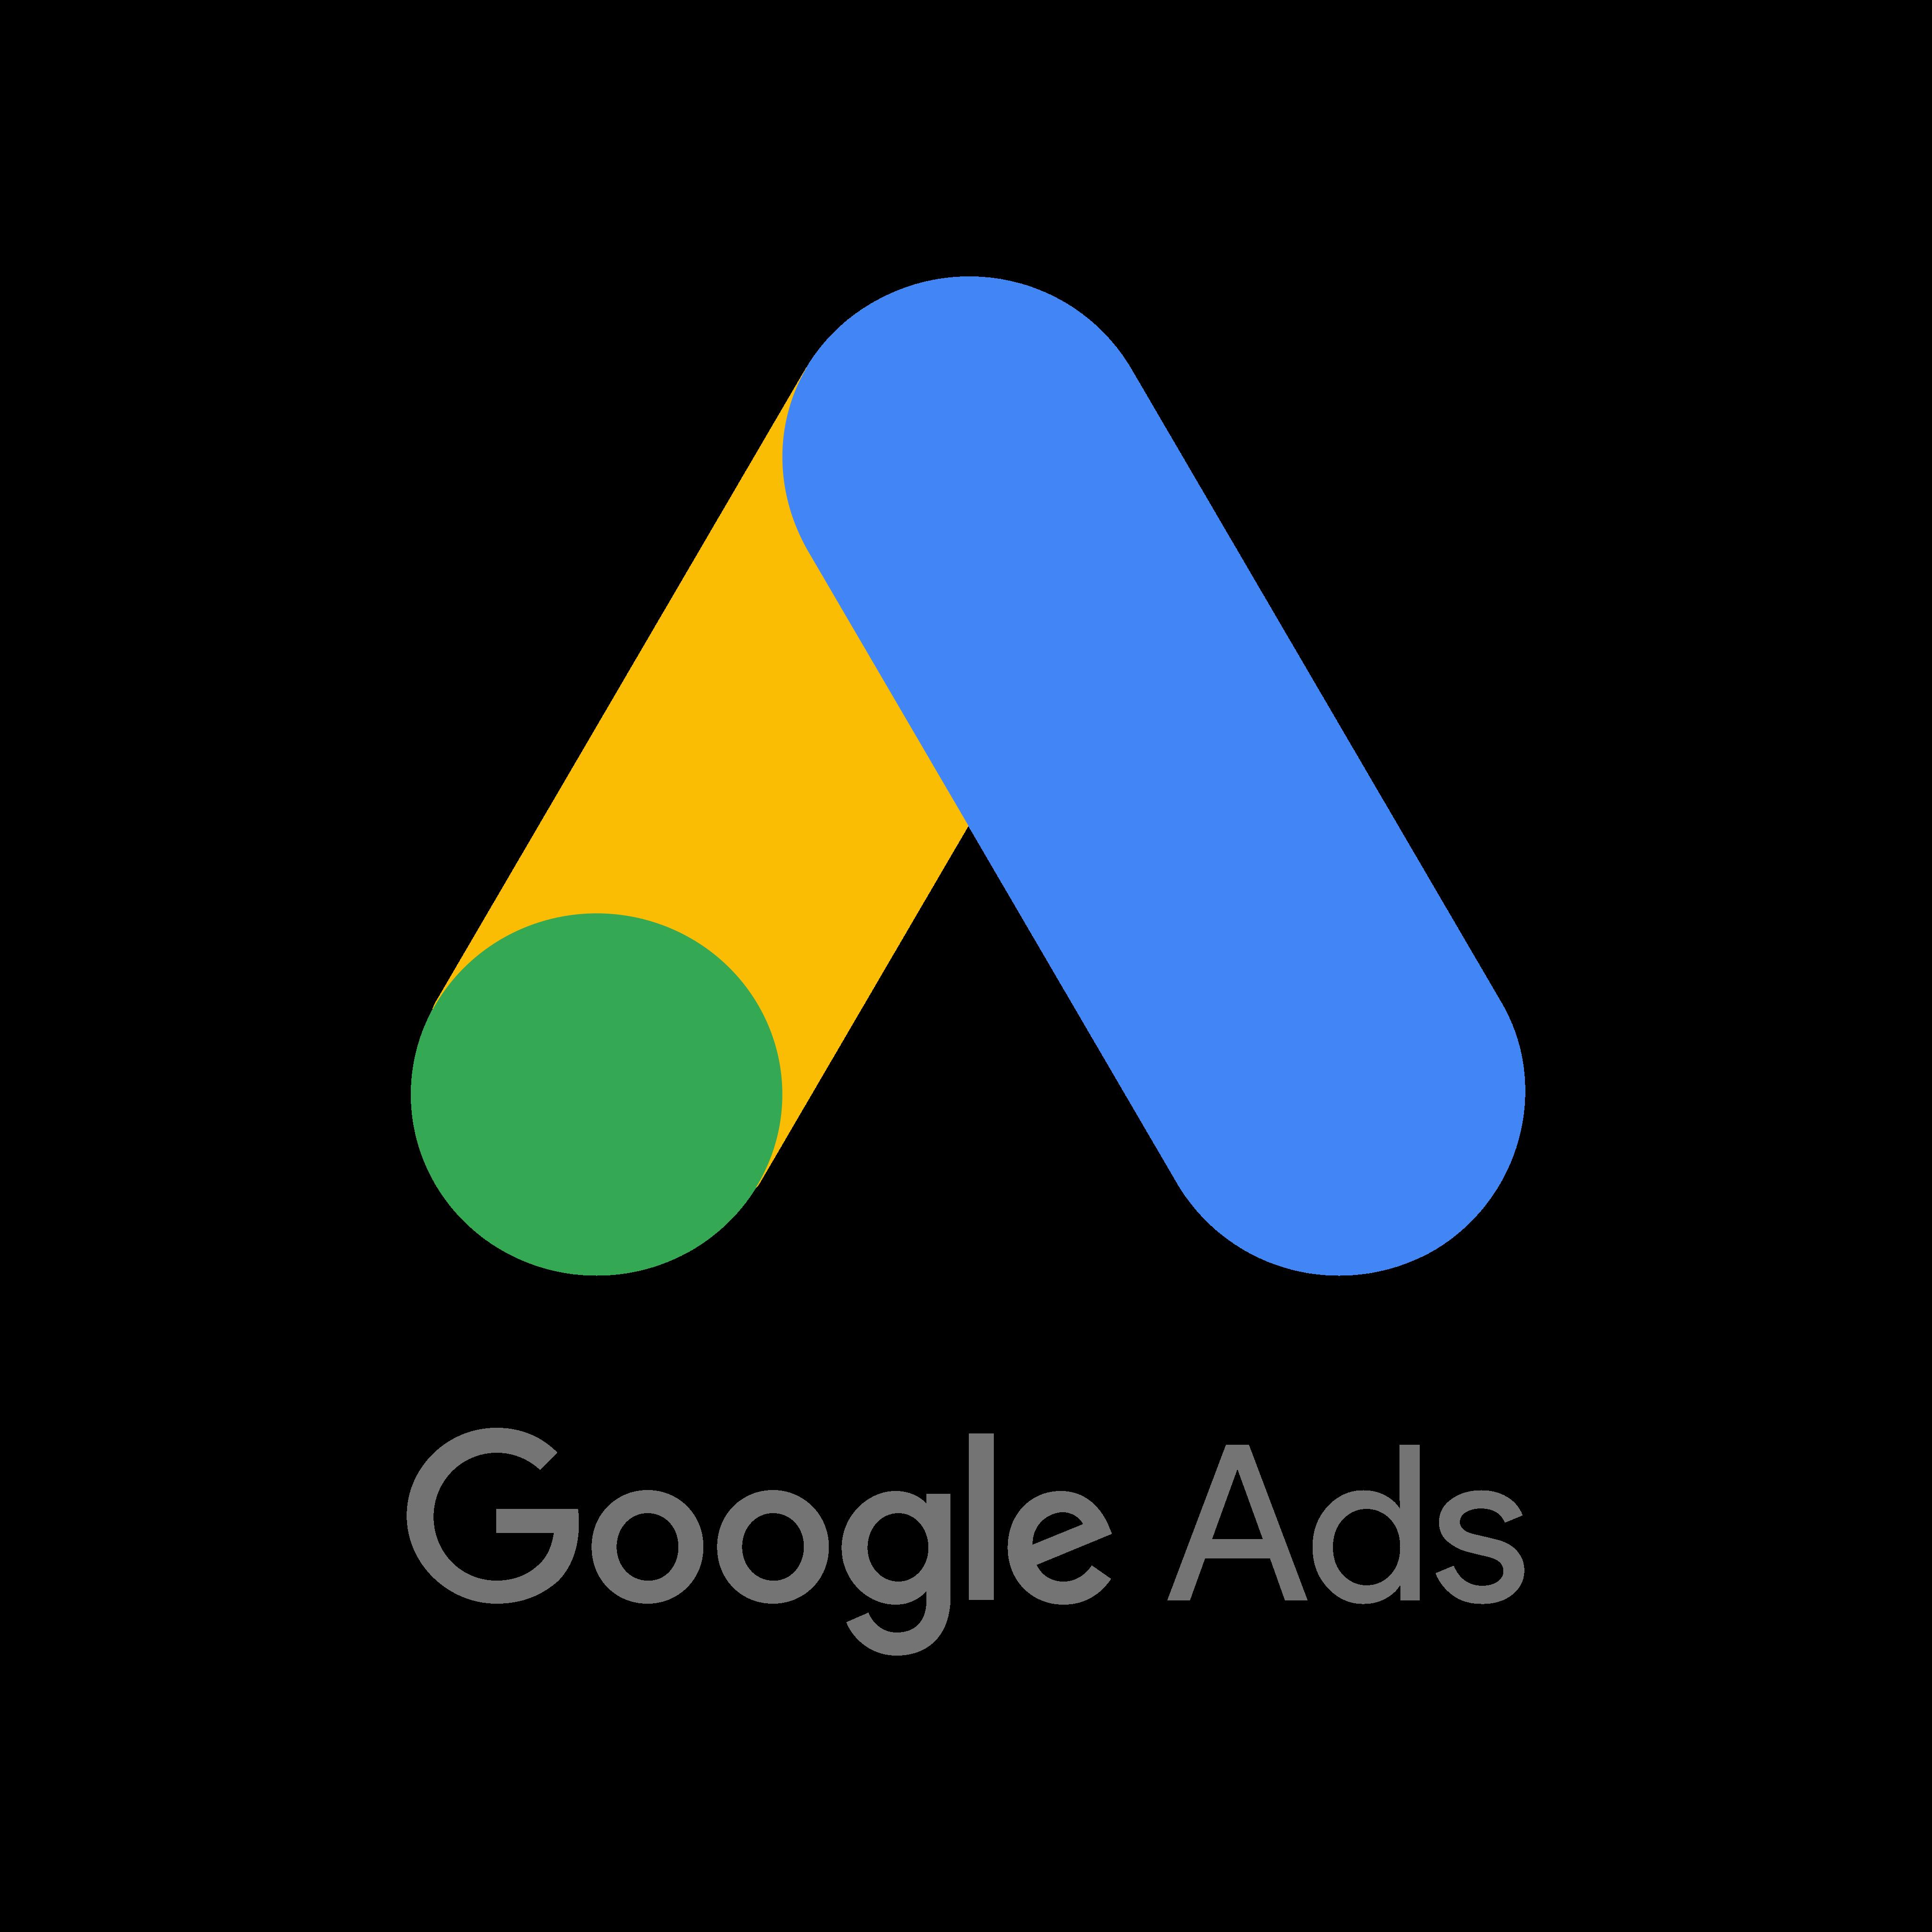 google adwords logo 0 - Google Ads Logo